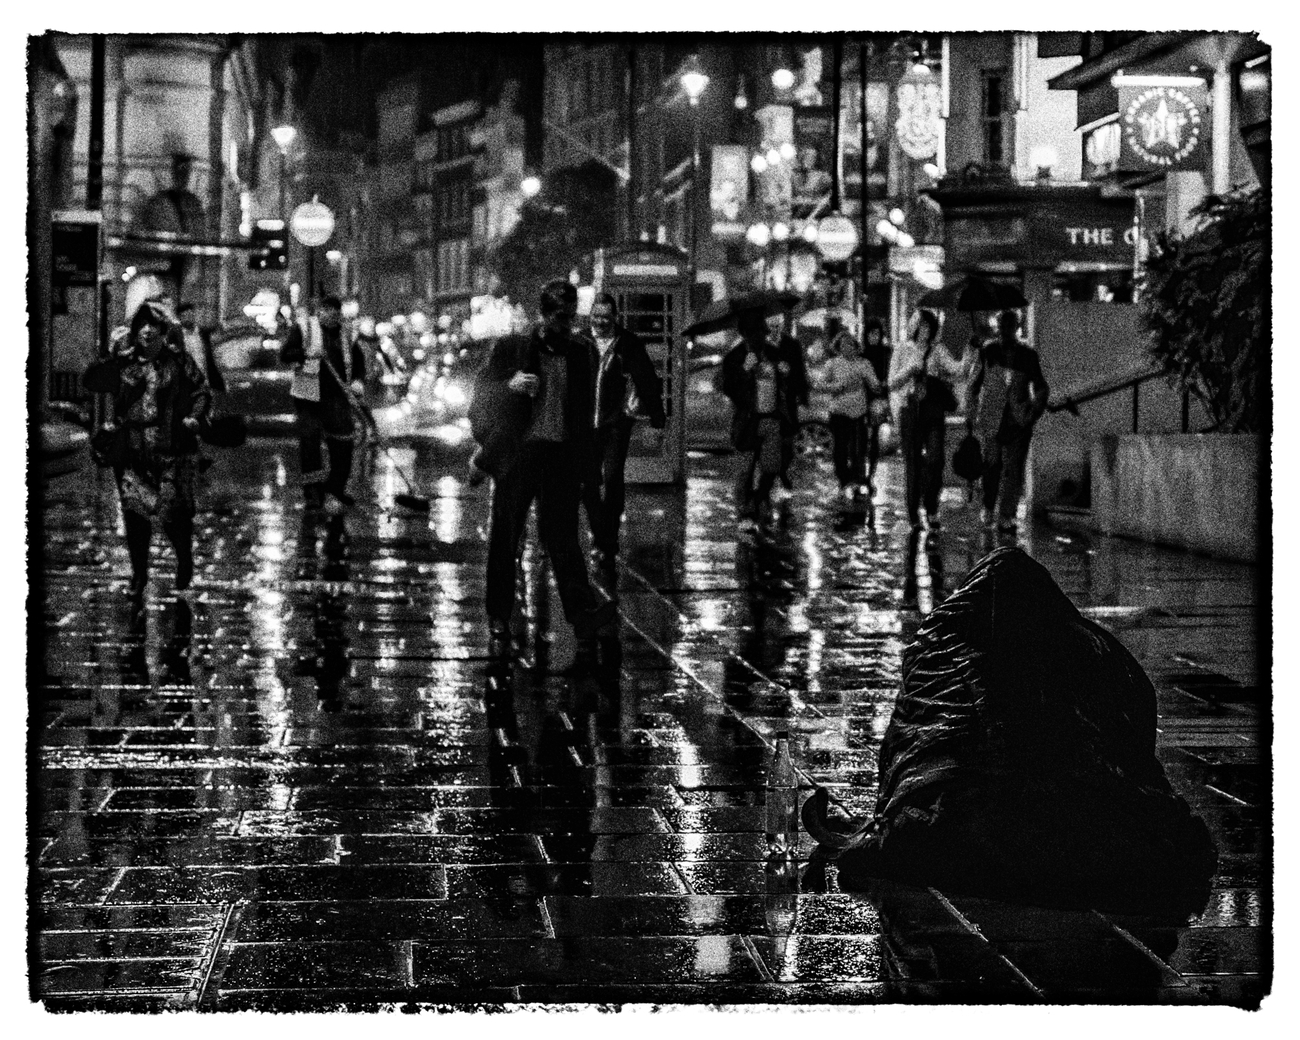 London at night - Rushing home